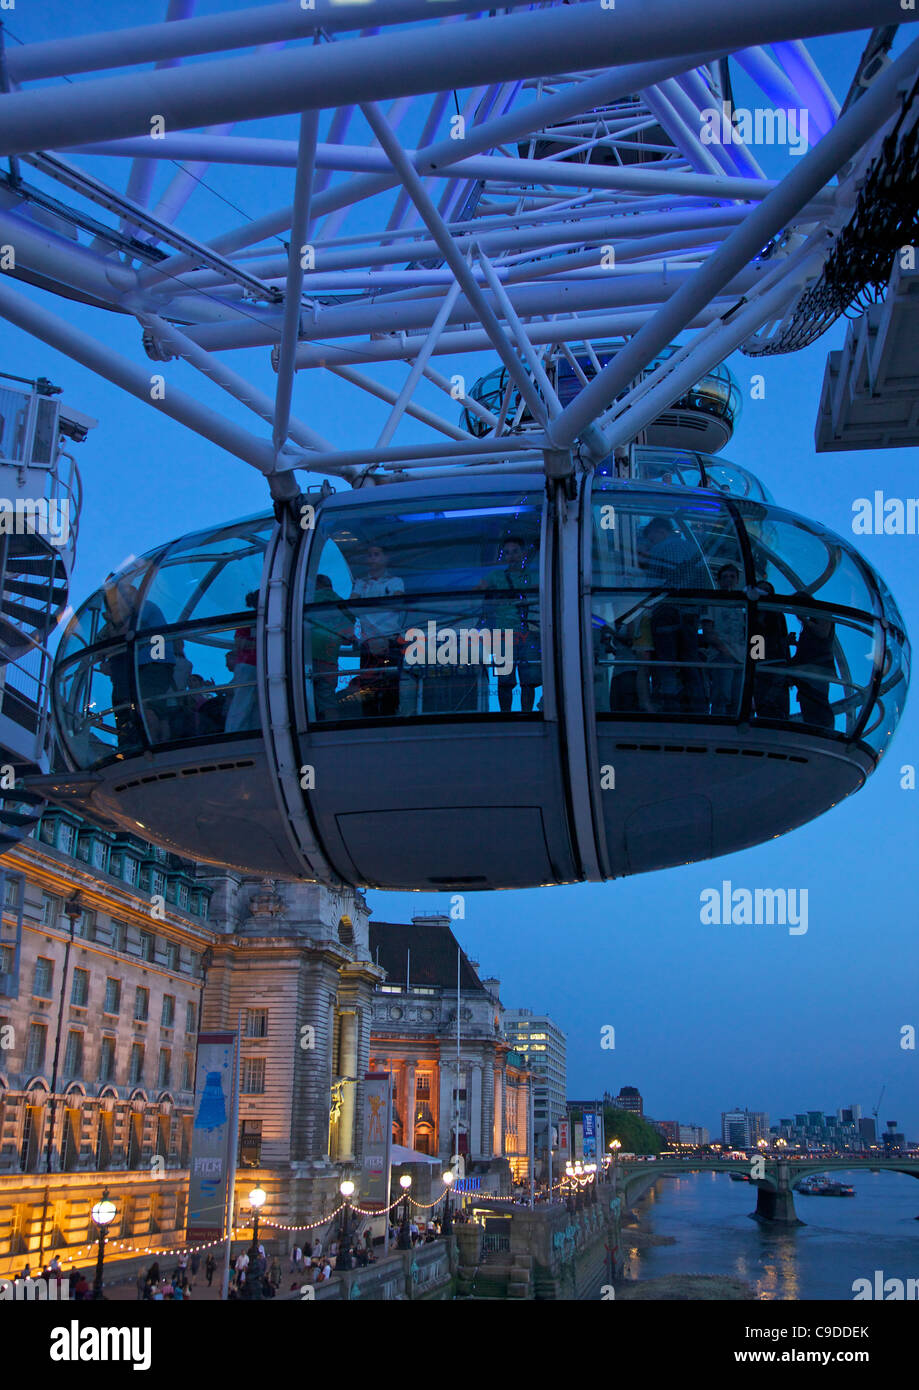 View of passenger pod capsule of the London Eye at dusk,  South Bank, London,  England, UK, United Kingdom, GB, - Stock Image